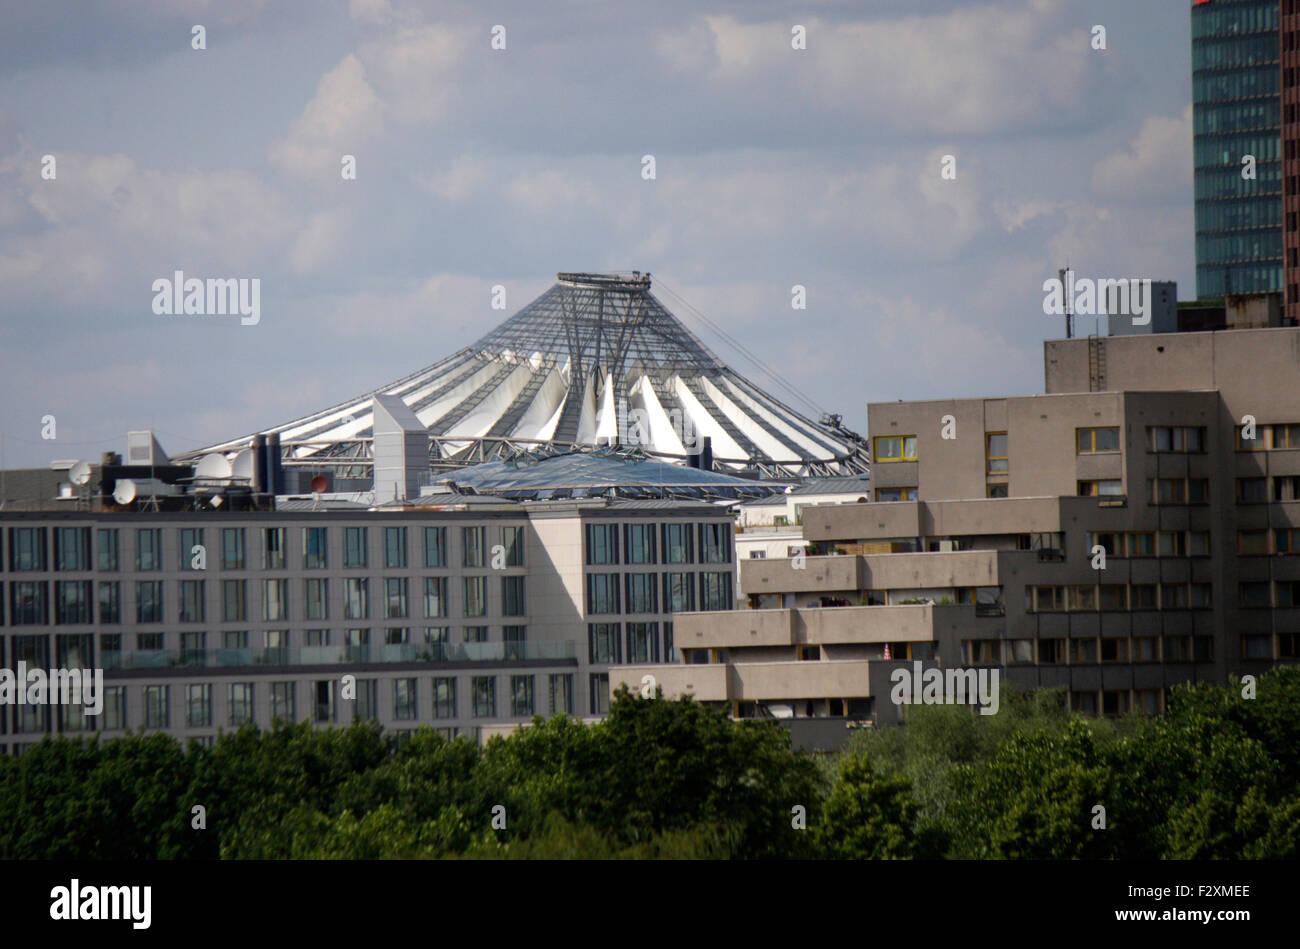 Sony Center am Potsdamer Platz - Skyline, Berlin-Kreuzberg. - Stock Image